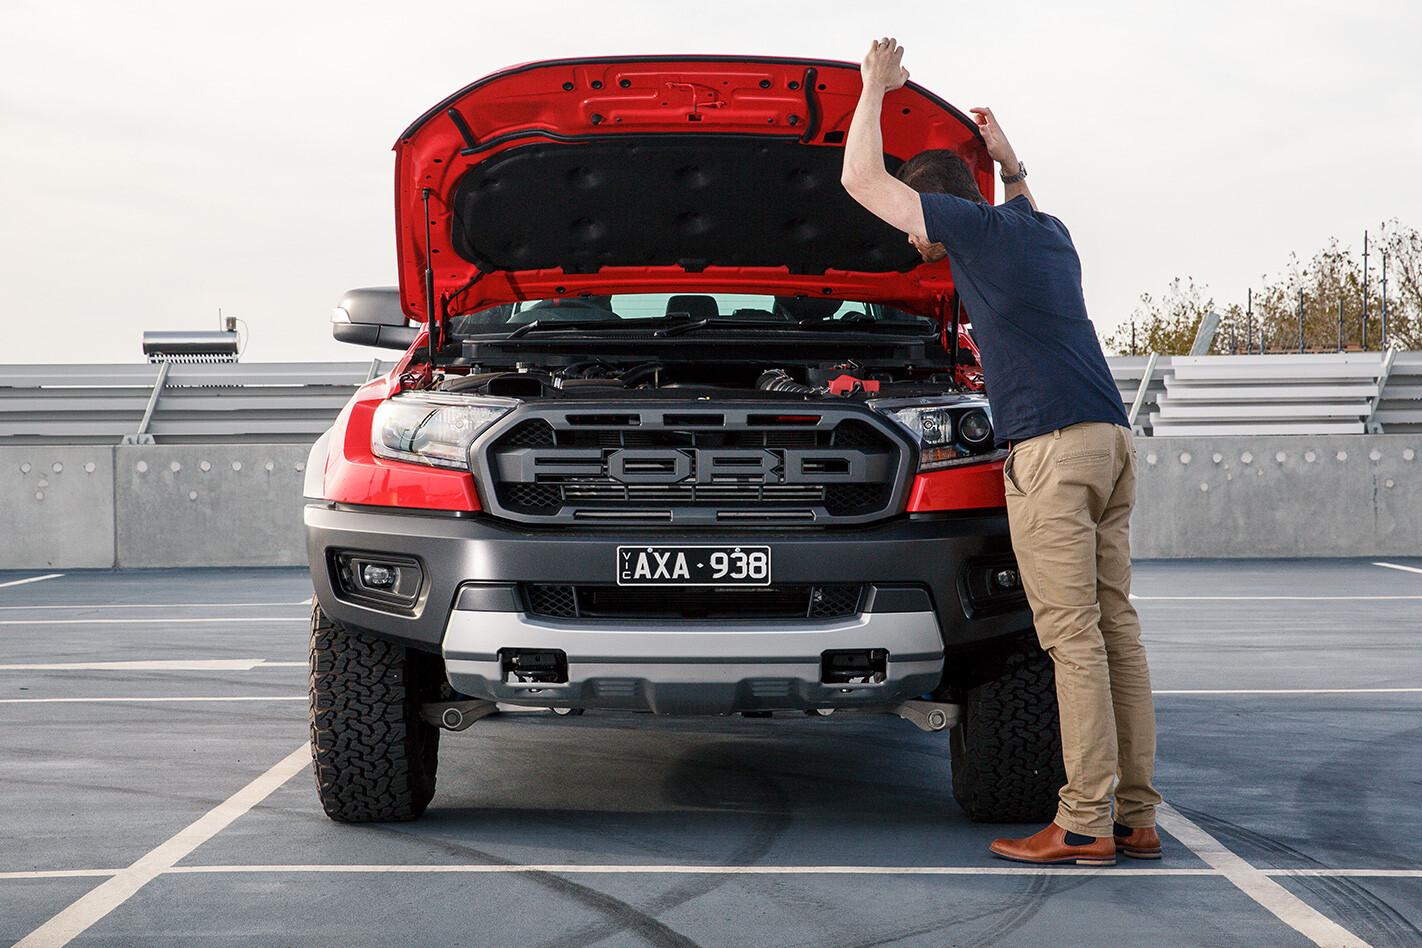 Inspecting the 2019 Ford Ranger Raptor Engine